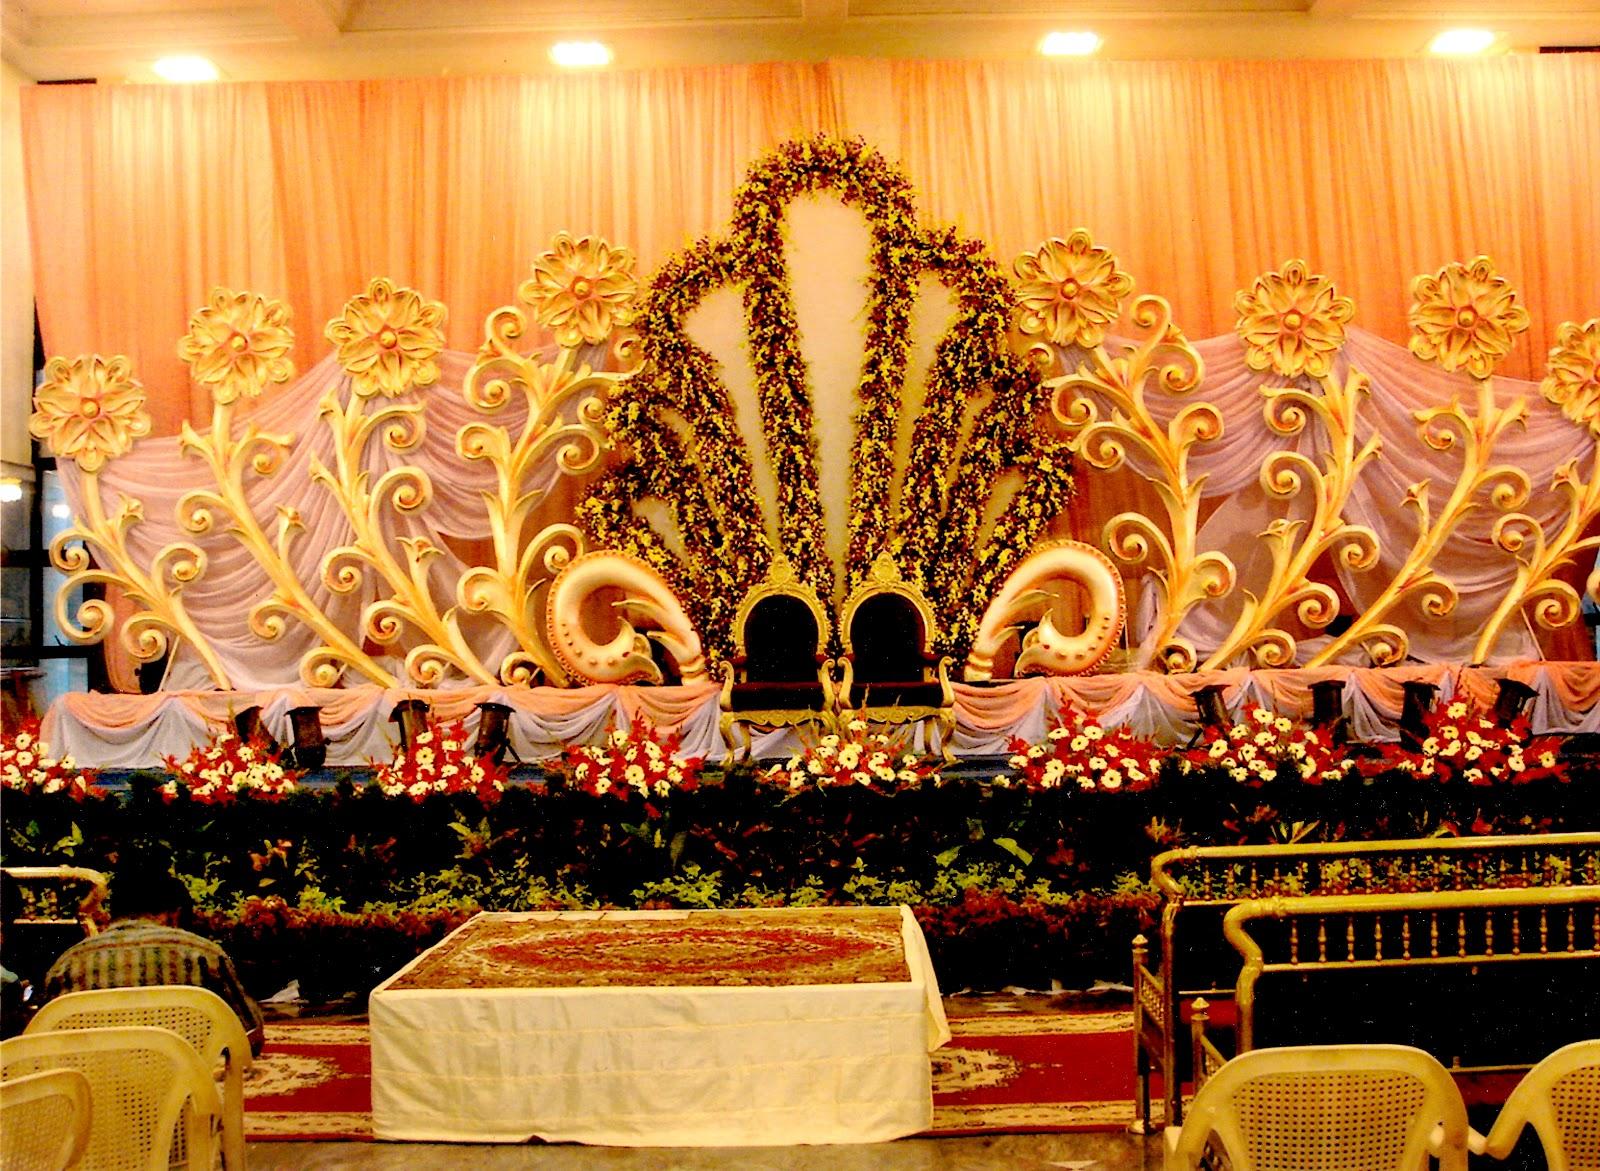 39 - Traditional Wedding Sets